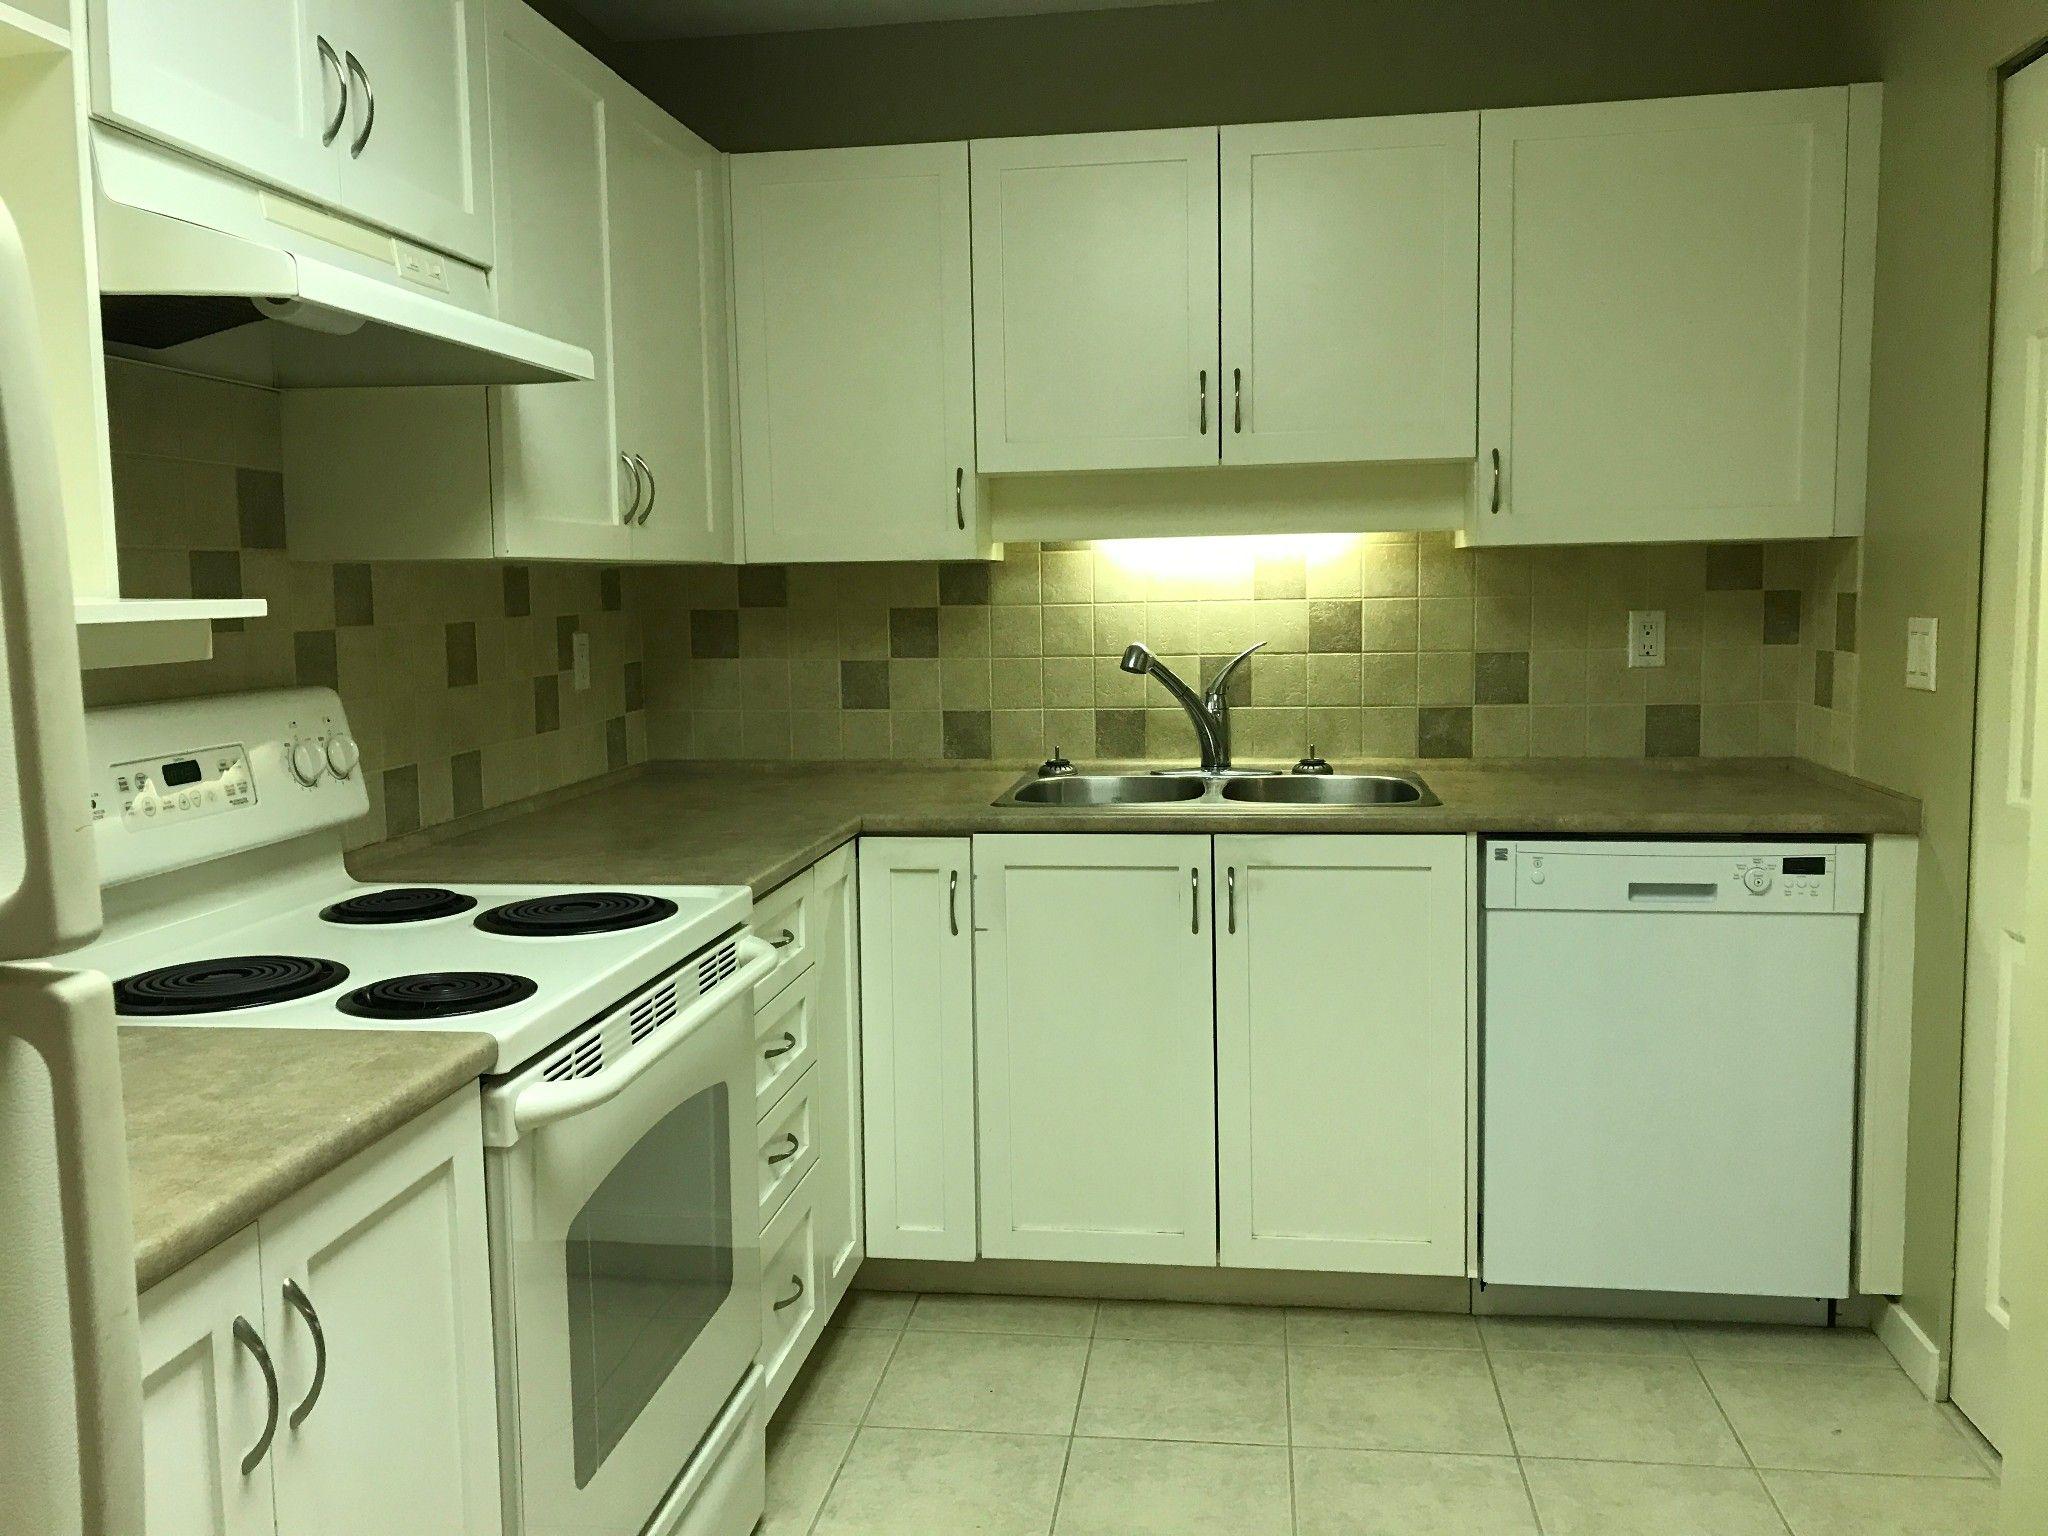 Photo 7: Photos: #329 2700 McCallum Rd. in Abbotsford: Central Abbotsford Condo for rent